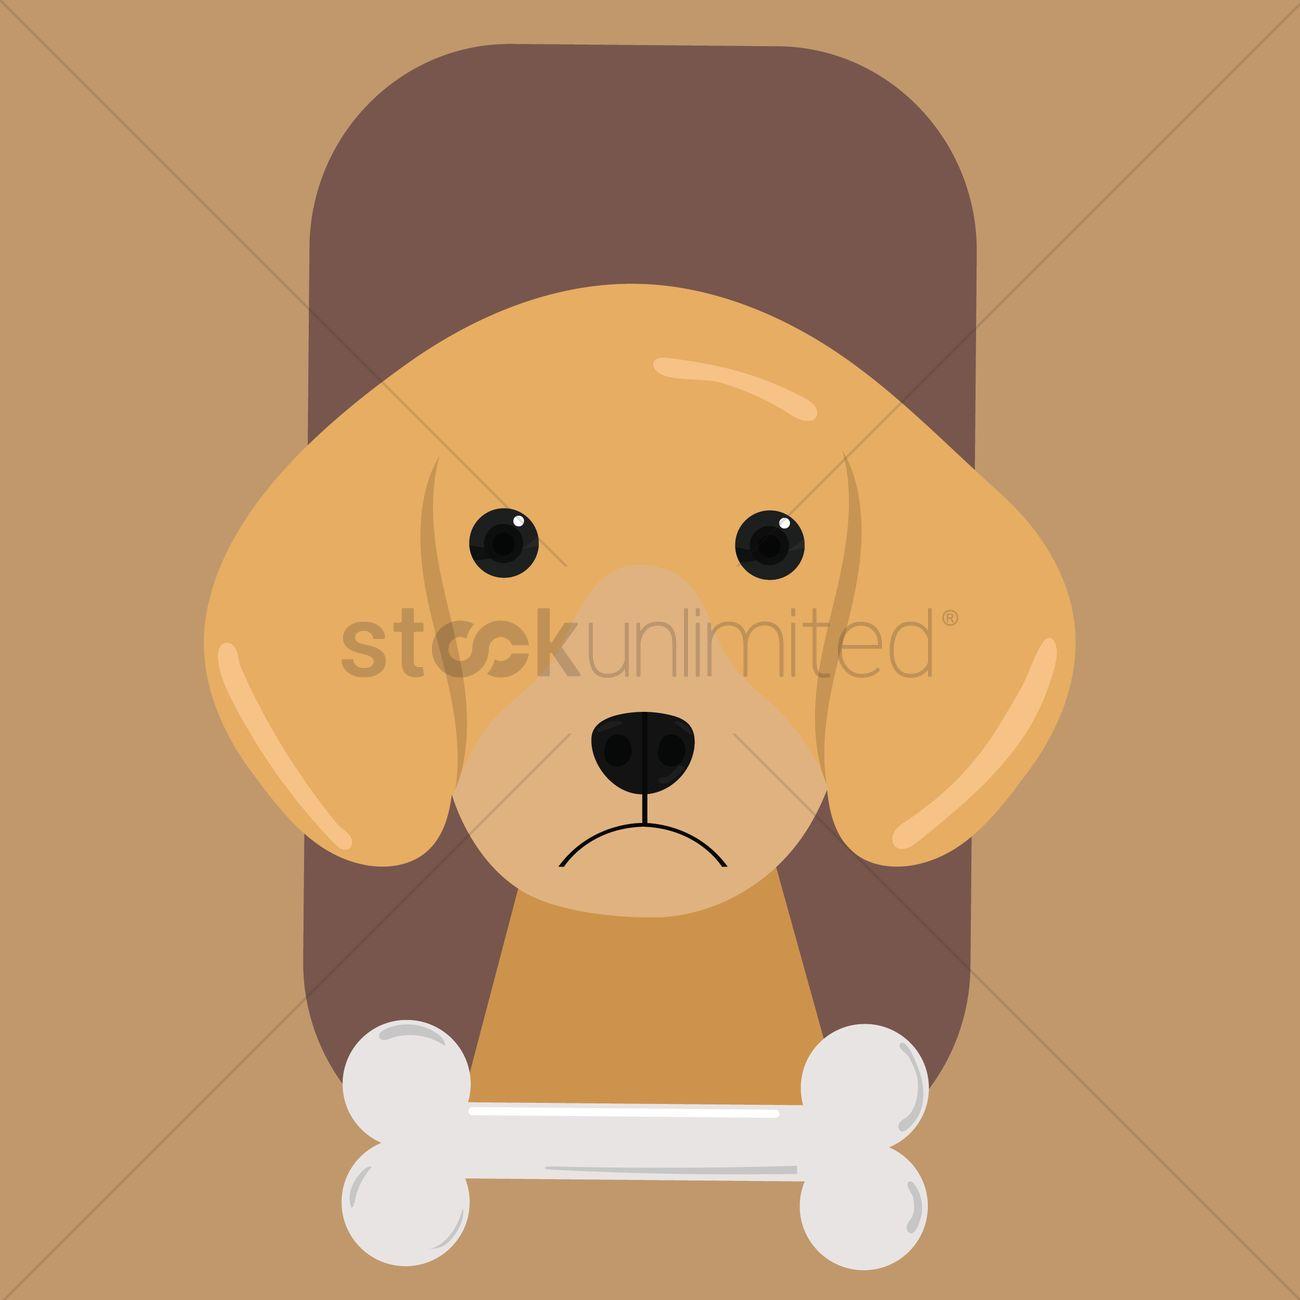 Free Golden Retriever Puppy With Bone Vector Image 1286822